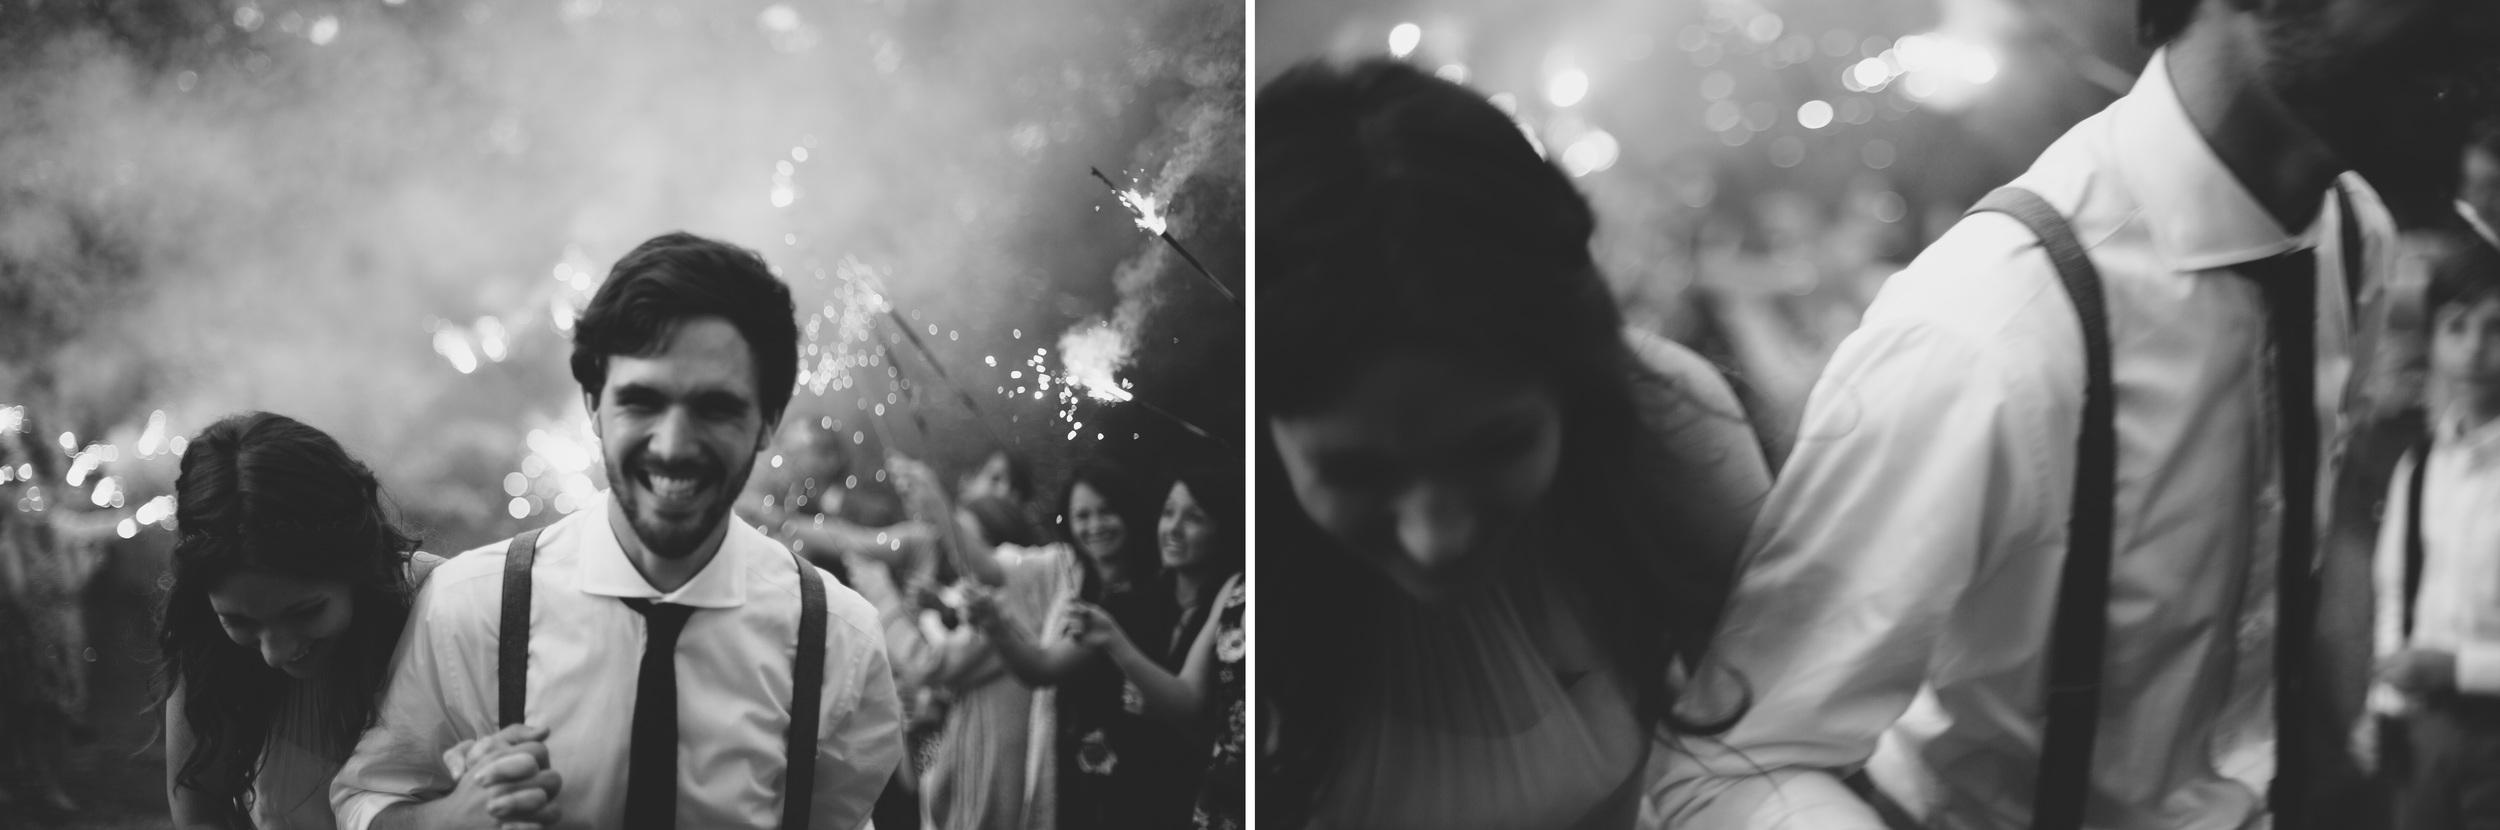 Zack + Hannah Millsaps Wedding in Greenville SC Nashville Wedding Photographer Photography Anthology-111 copy.jpg